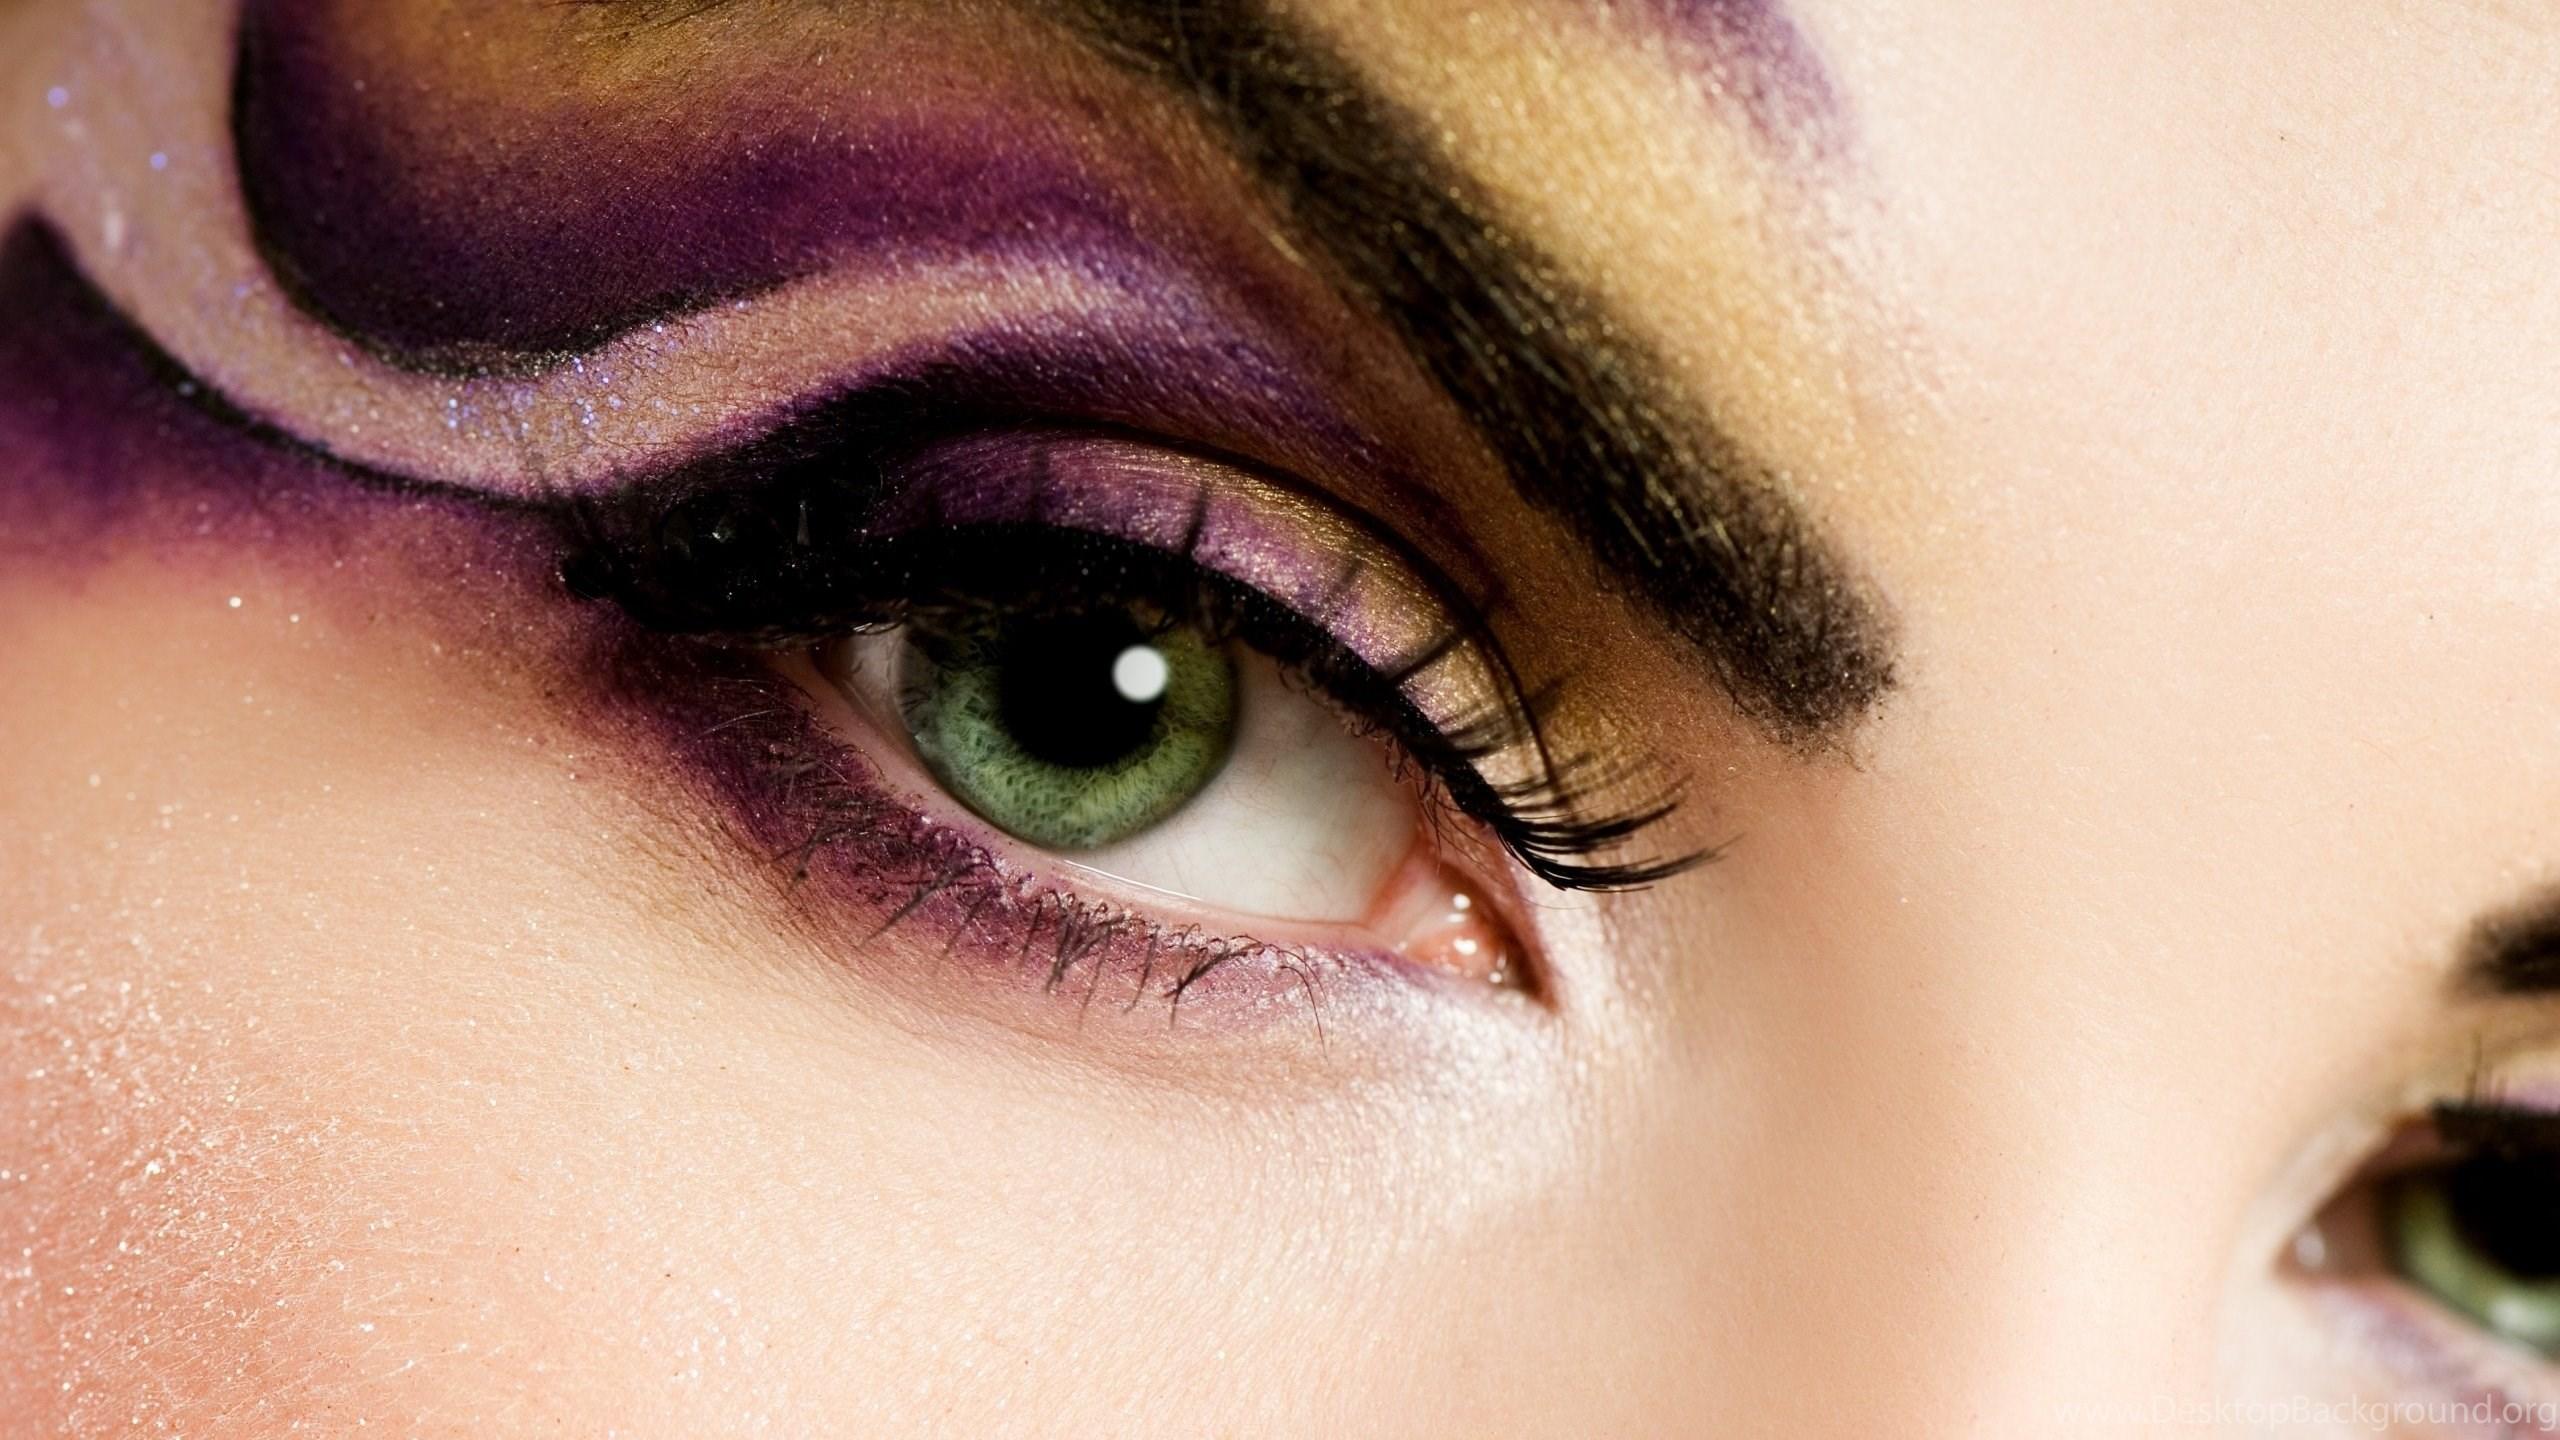 Hd wallpaper eyes - Netbook